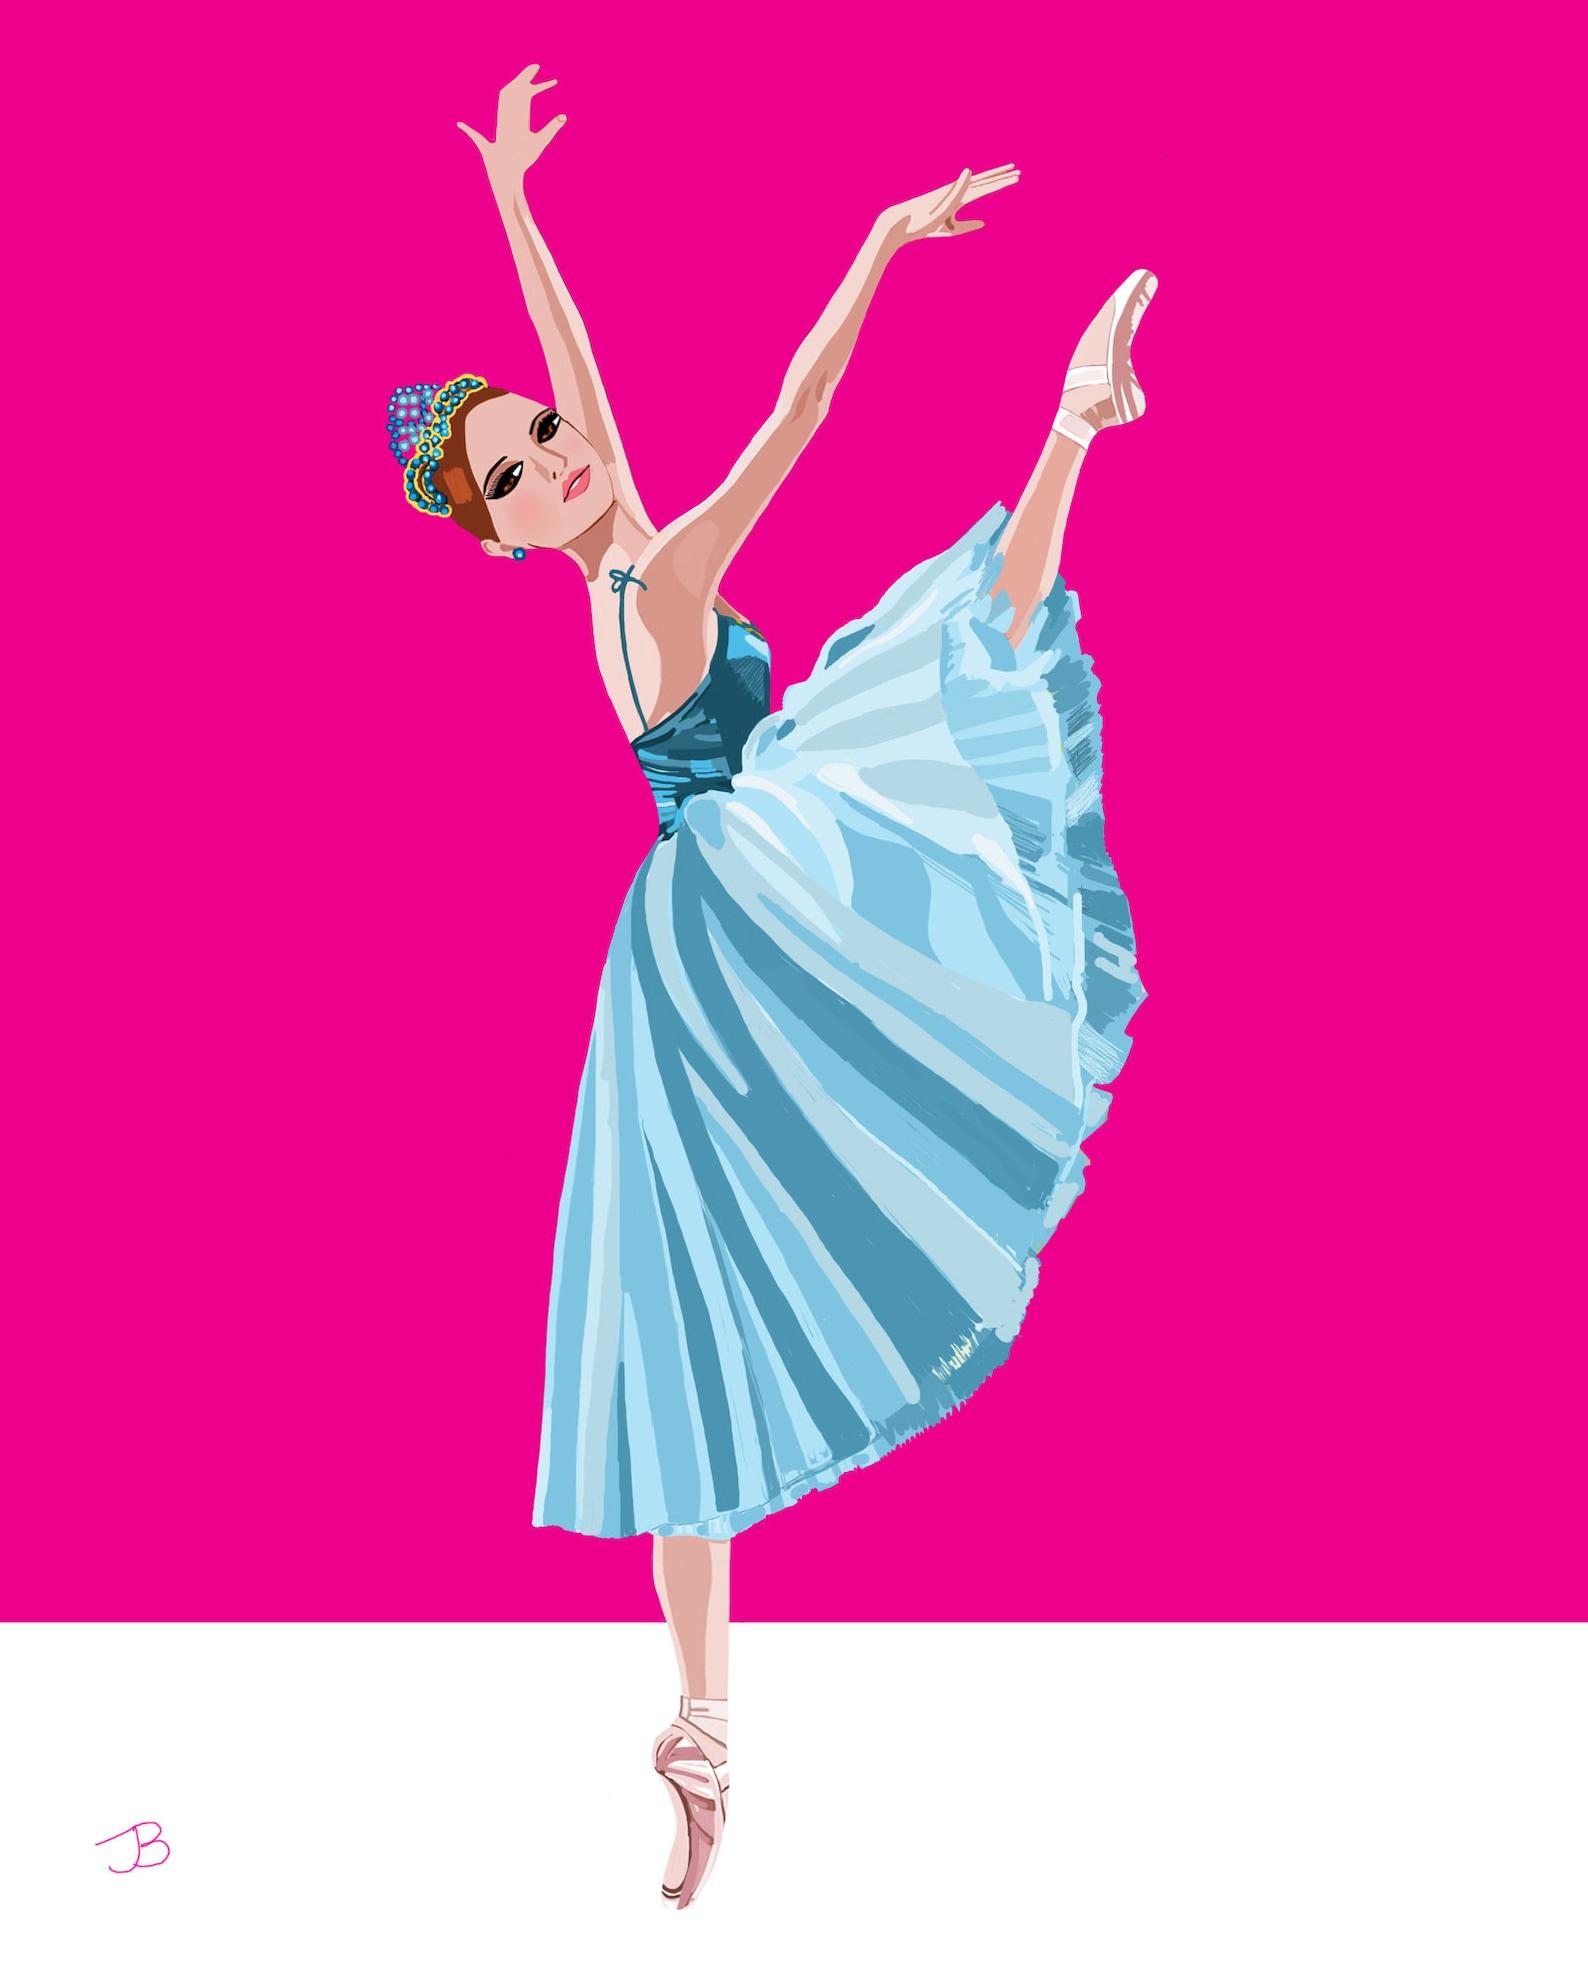 ballet print, blue tutu ballerina, pink ballerina poster, ballerina art, ballet gift, ballet wall decor, gift for baby ballerina